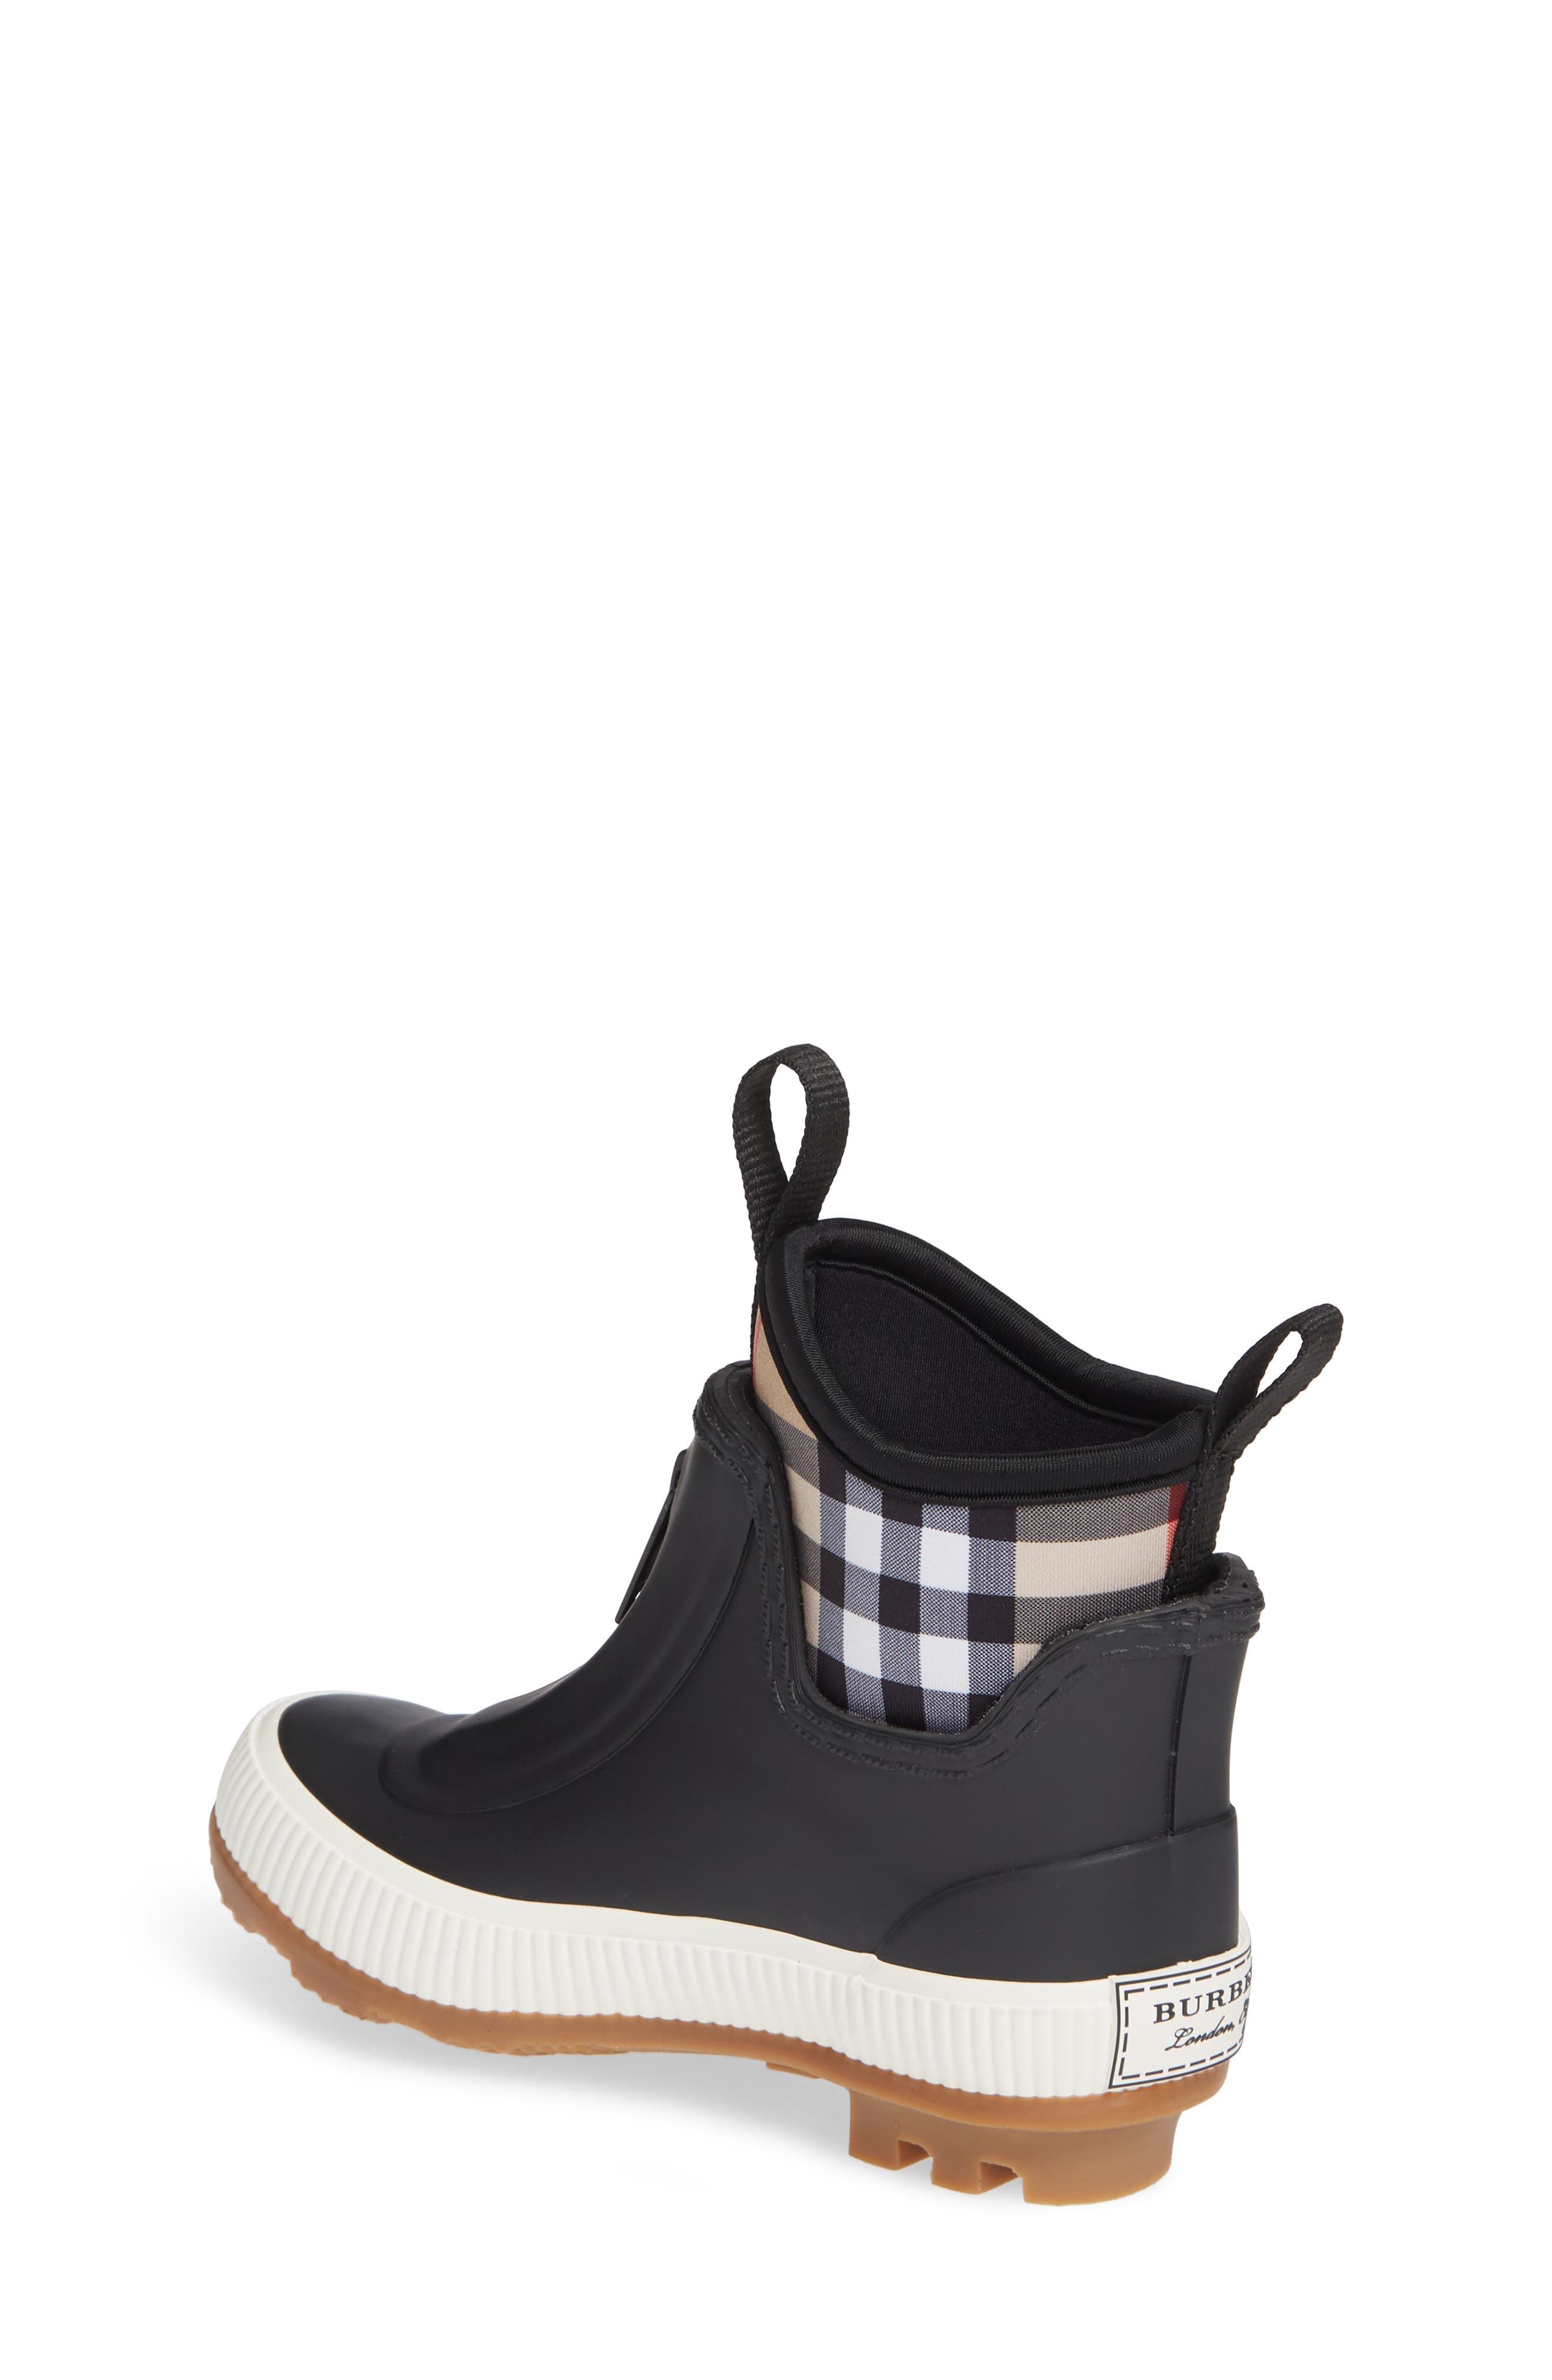 BURBERRY, Flinton Waterproof Rain Boot, Alternate thumbnail 2, color, BLACK